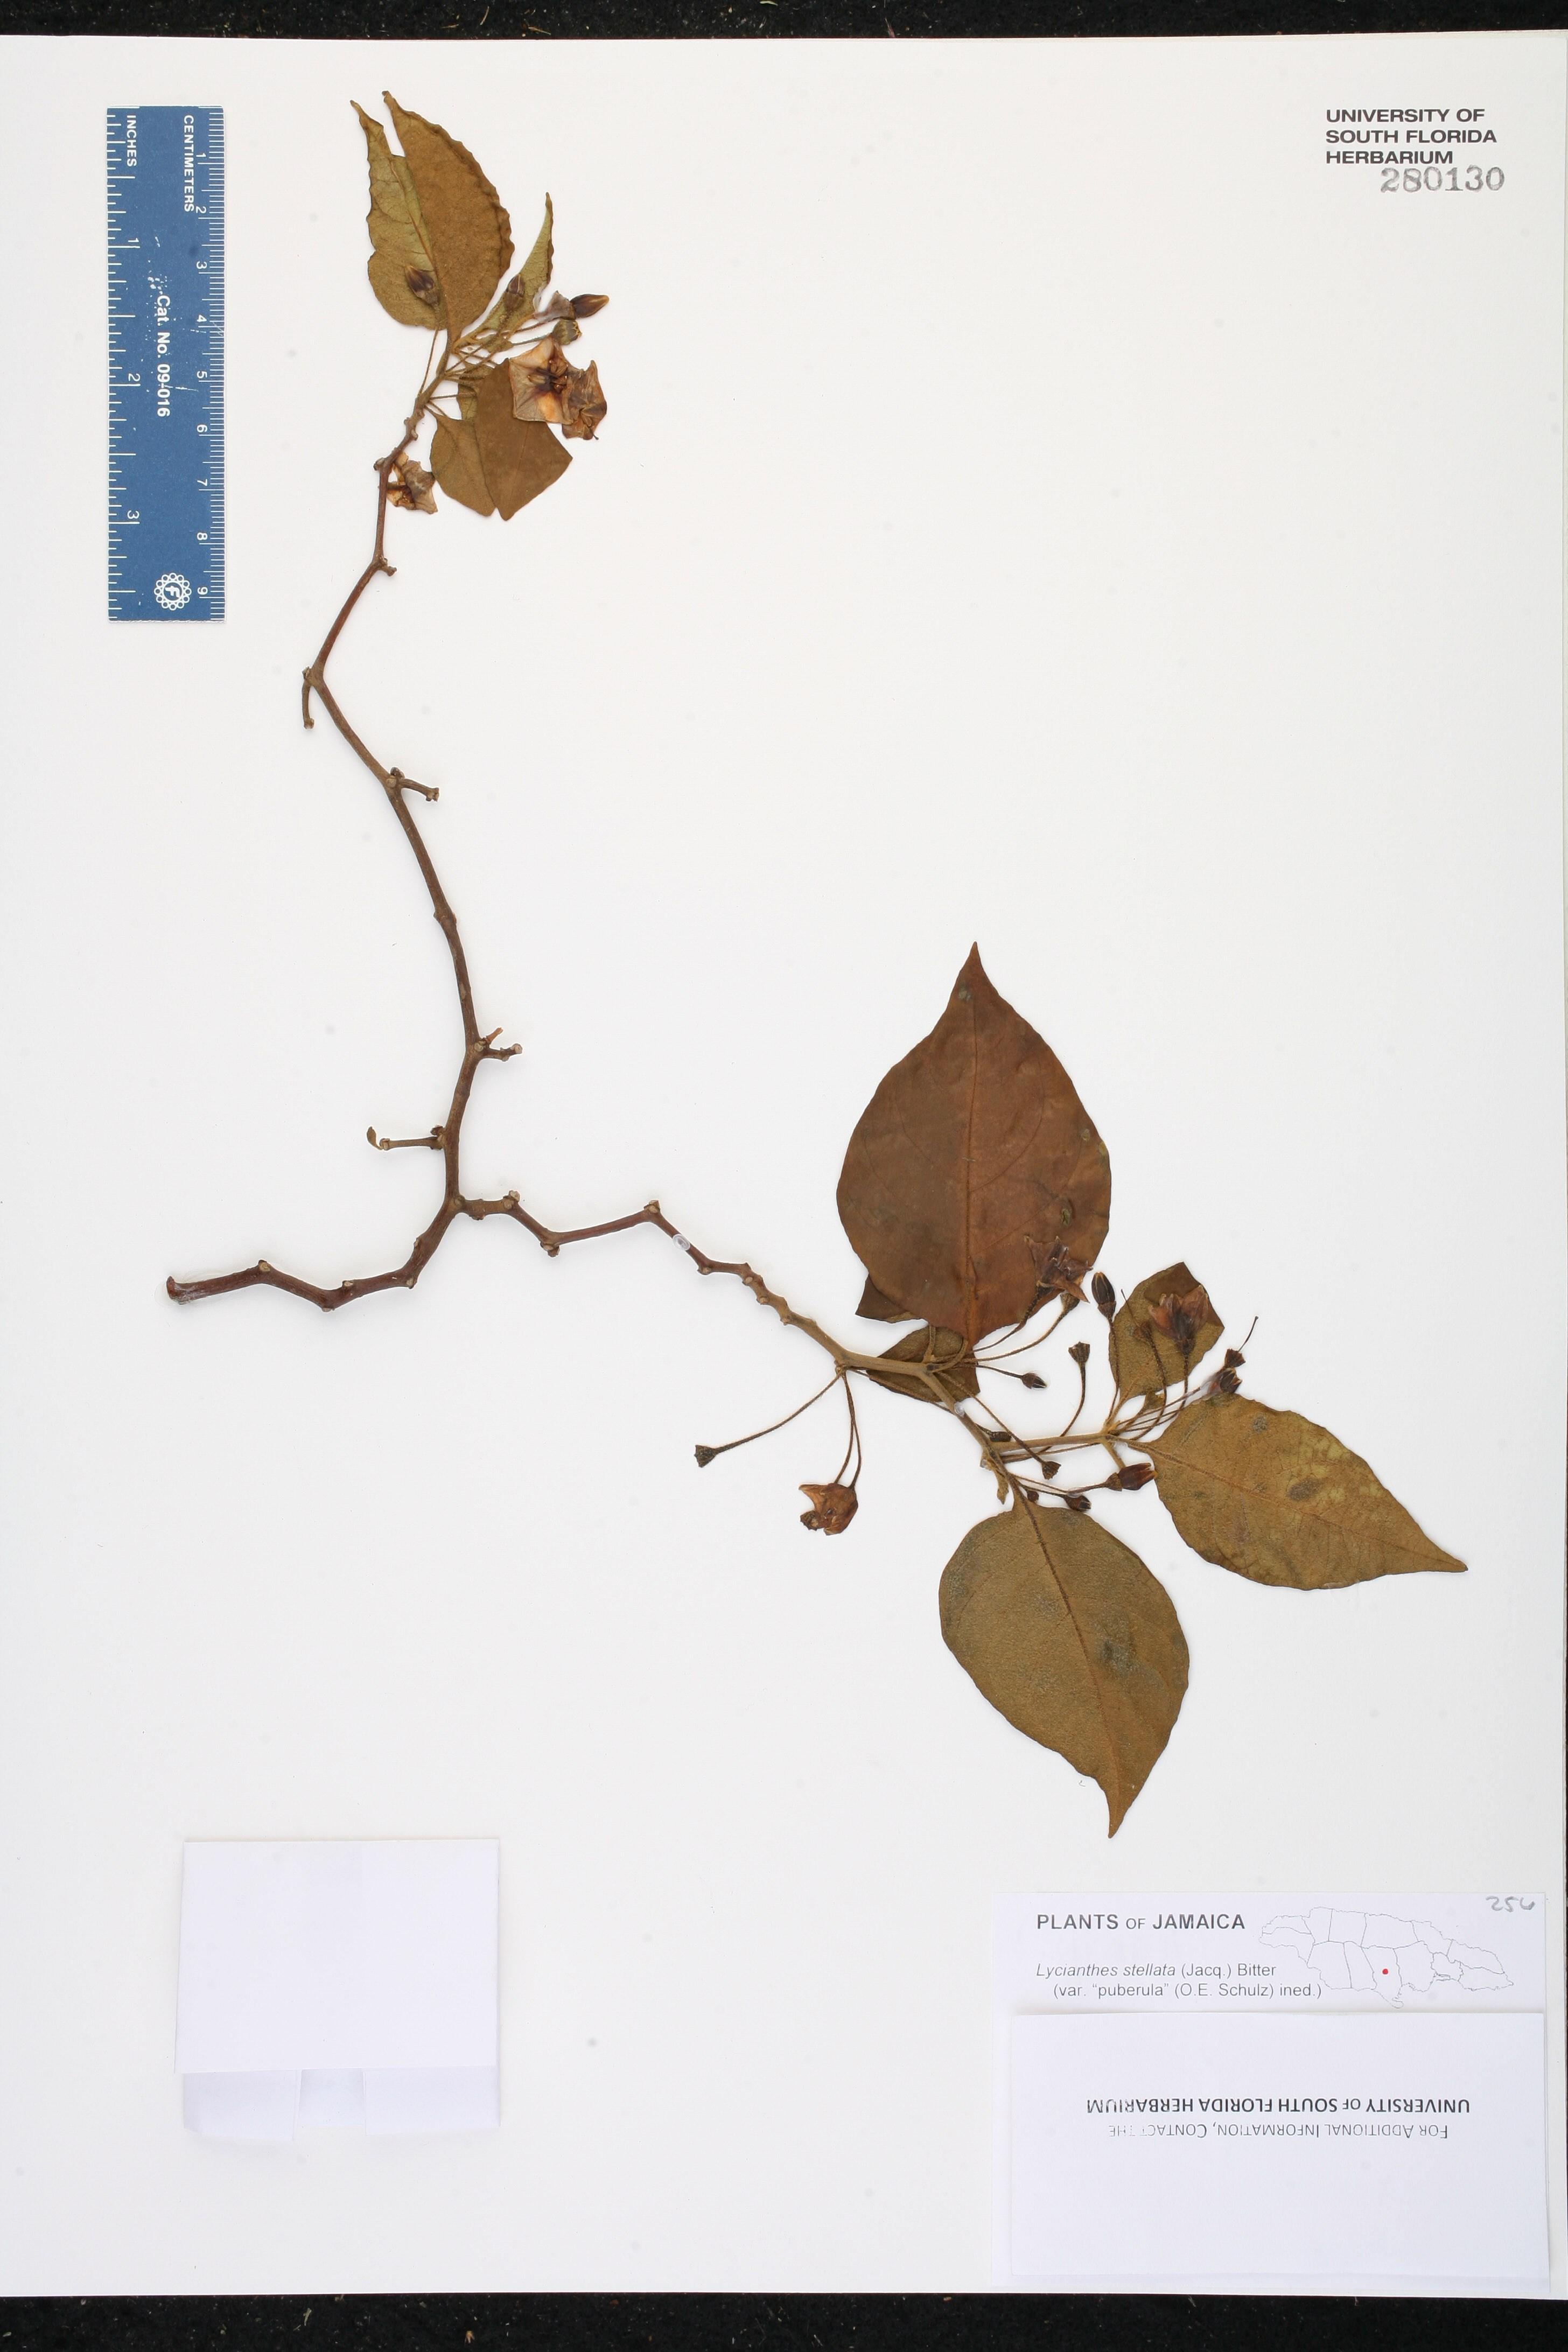 Lycianthes stellata image